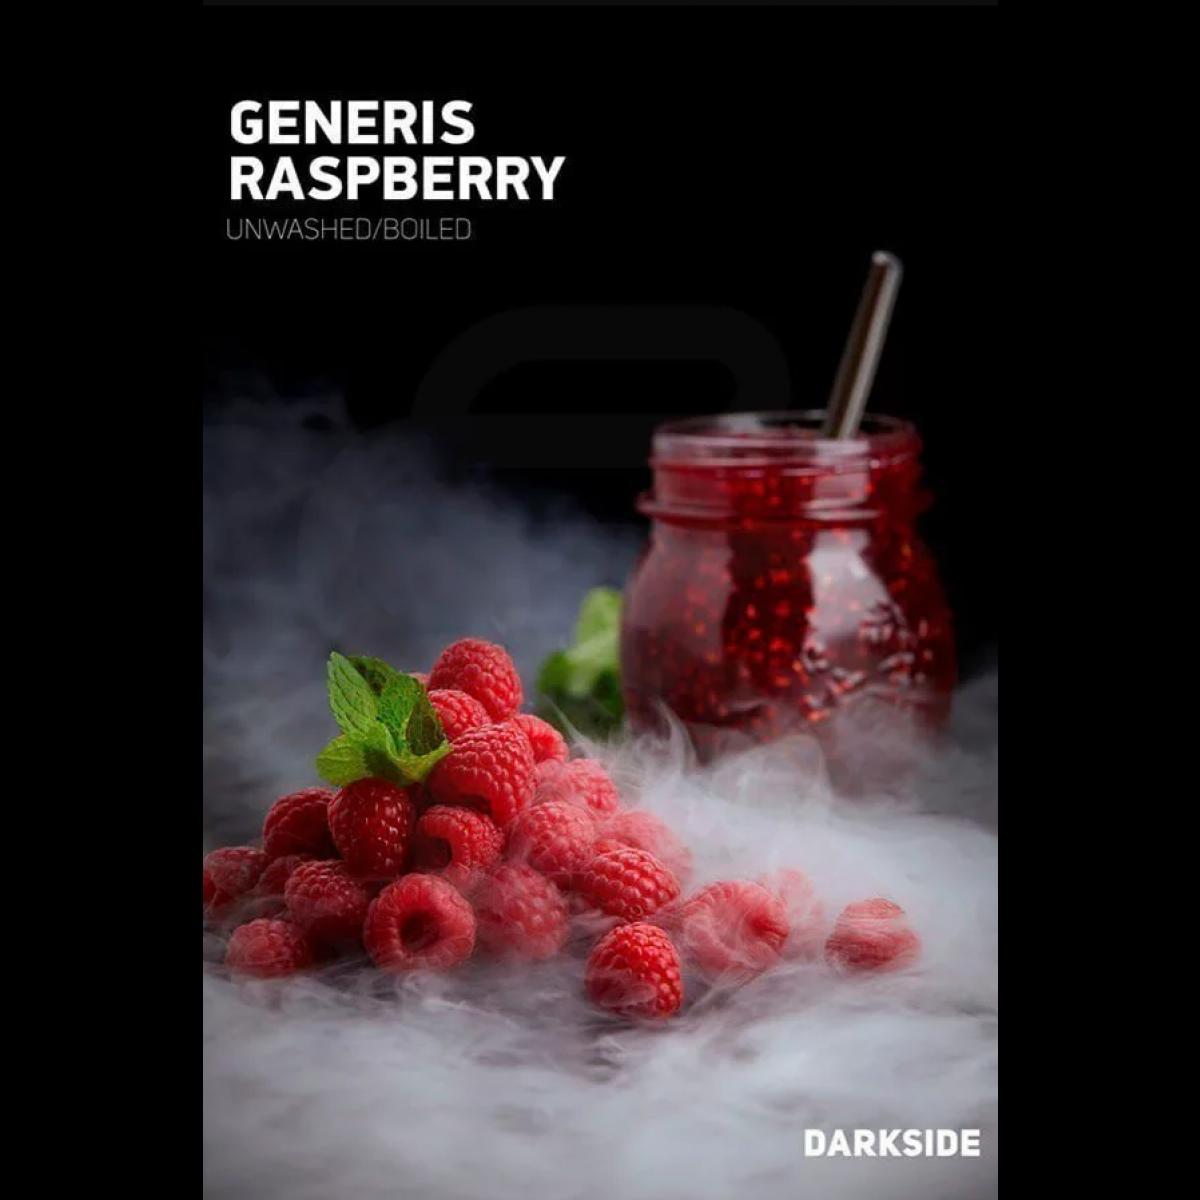 Табак Dark Side Generis Raspberry (Дарксайд Малина) 250 грамм